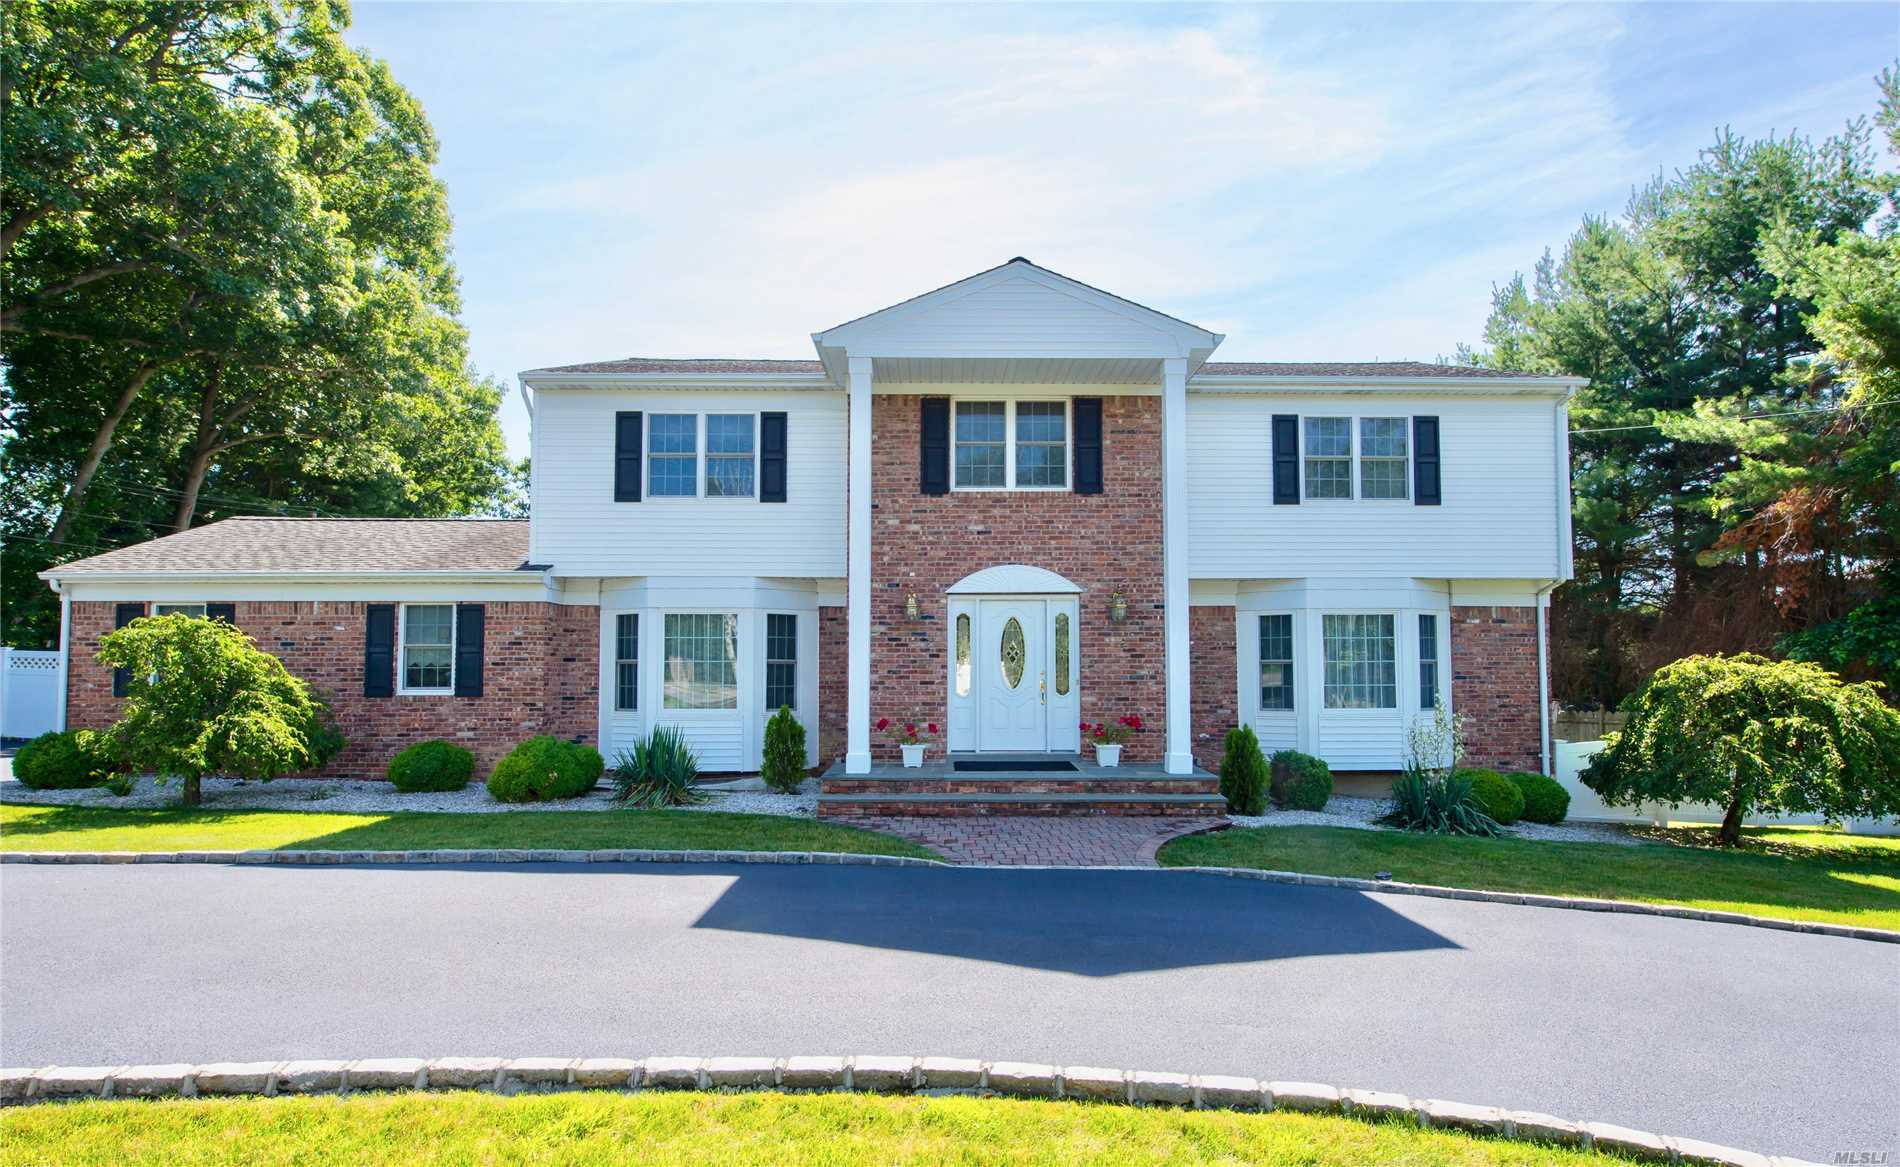 Photo of home for sale at 10 Vanderbilt Pky, Dix Hills NY